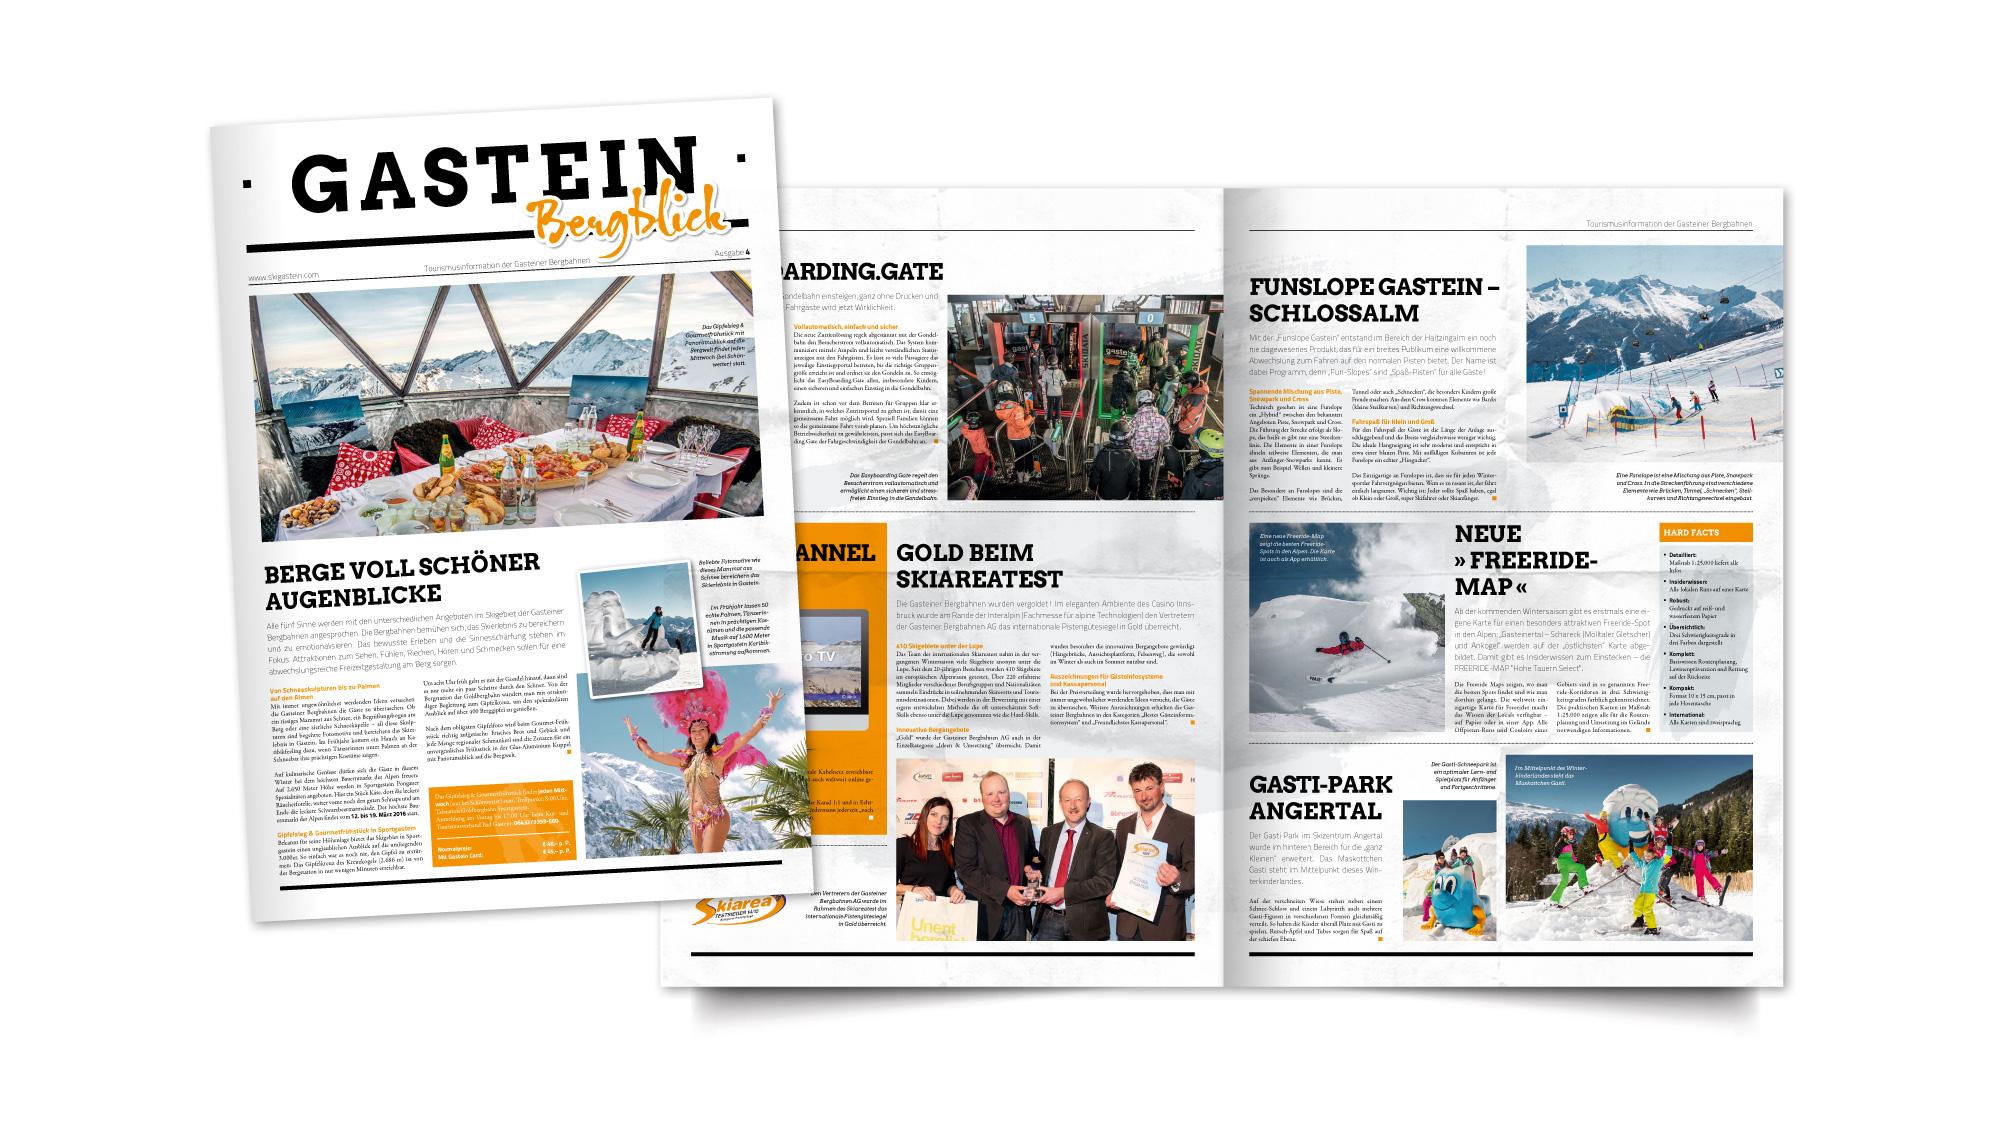 GasteinerBergbahnen_Bergblick_Info-Magazin_5